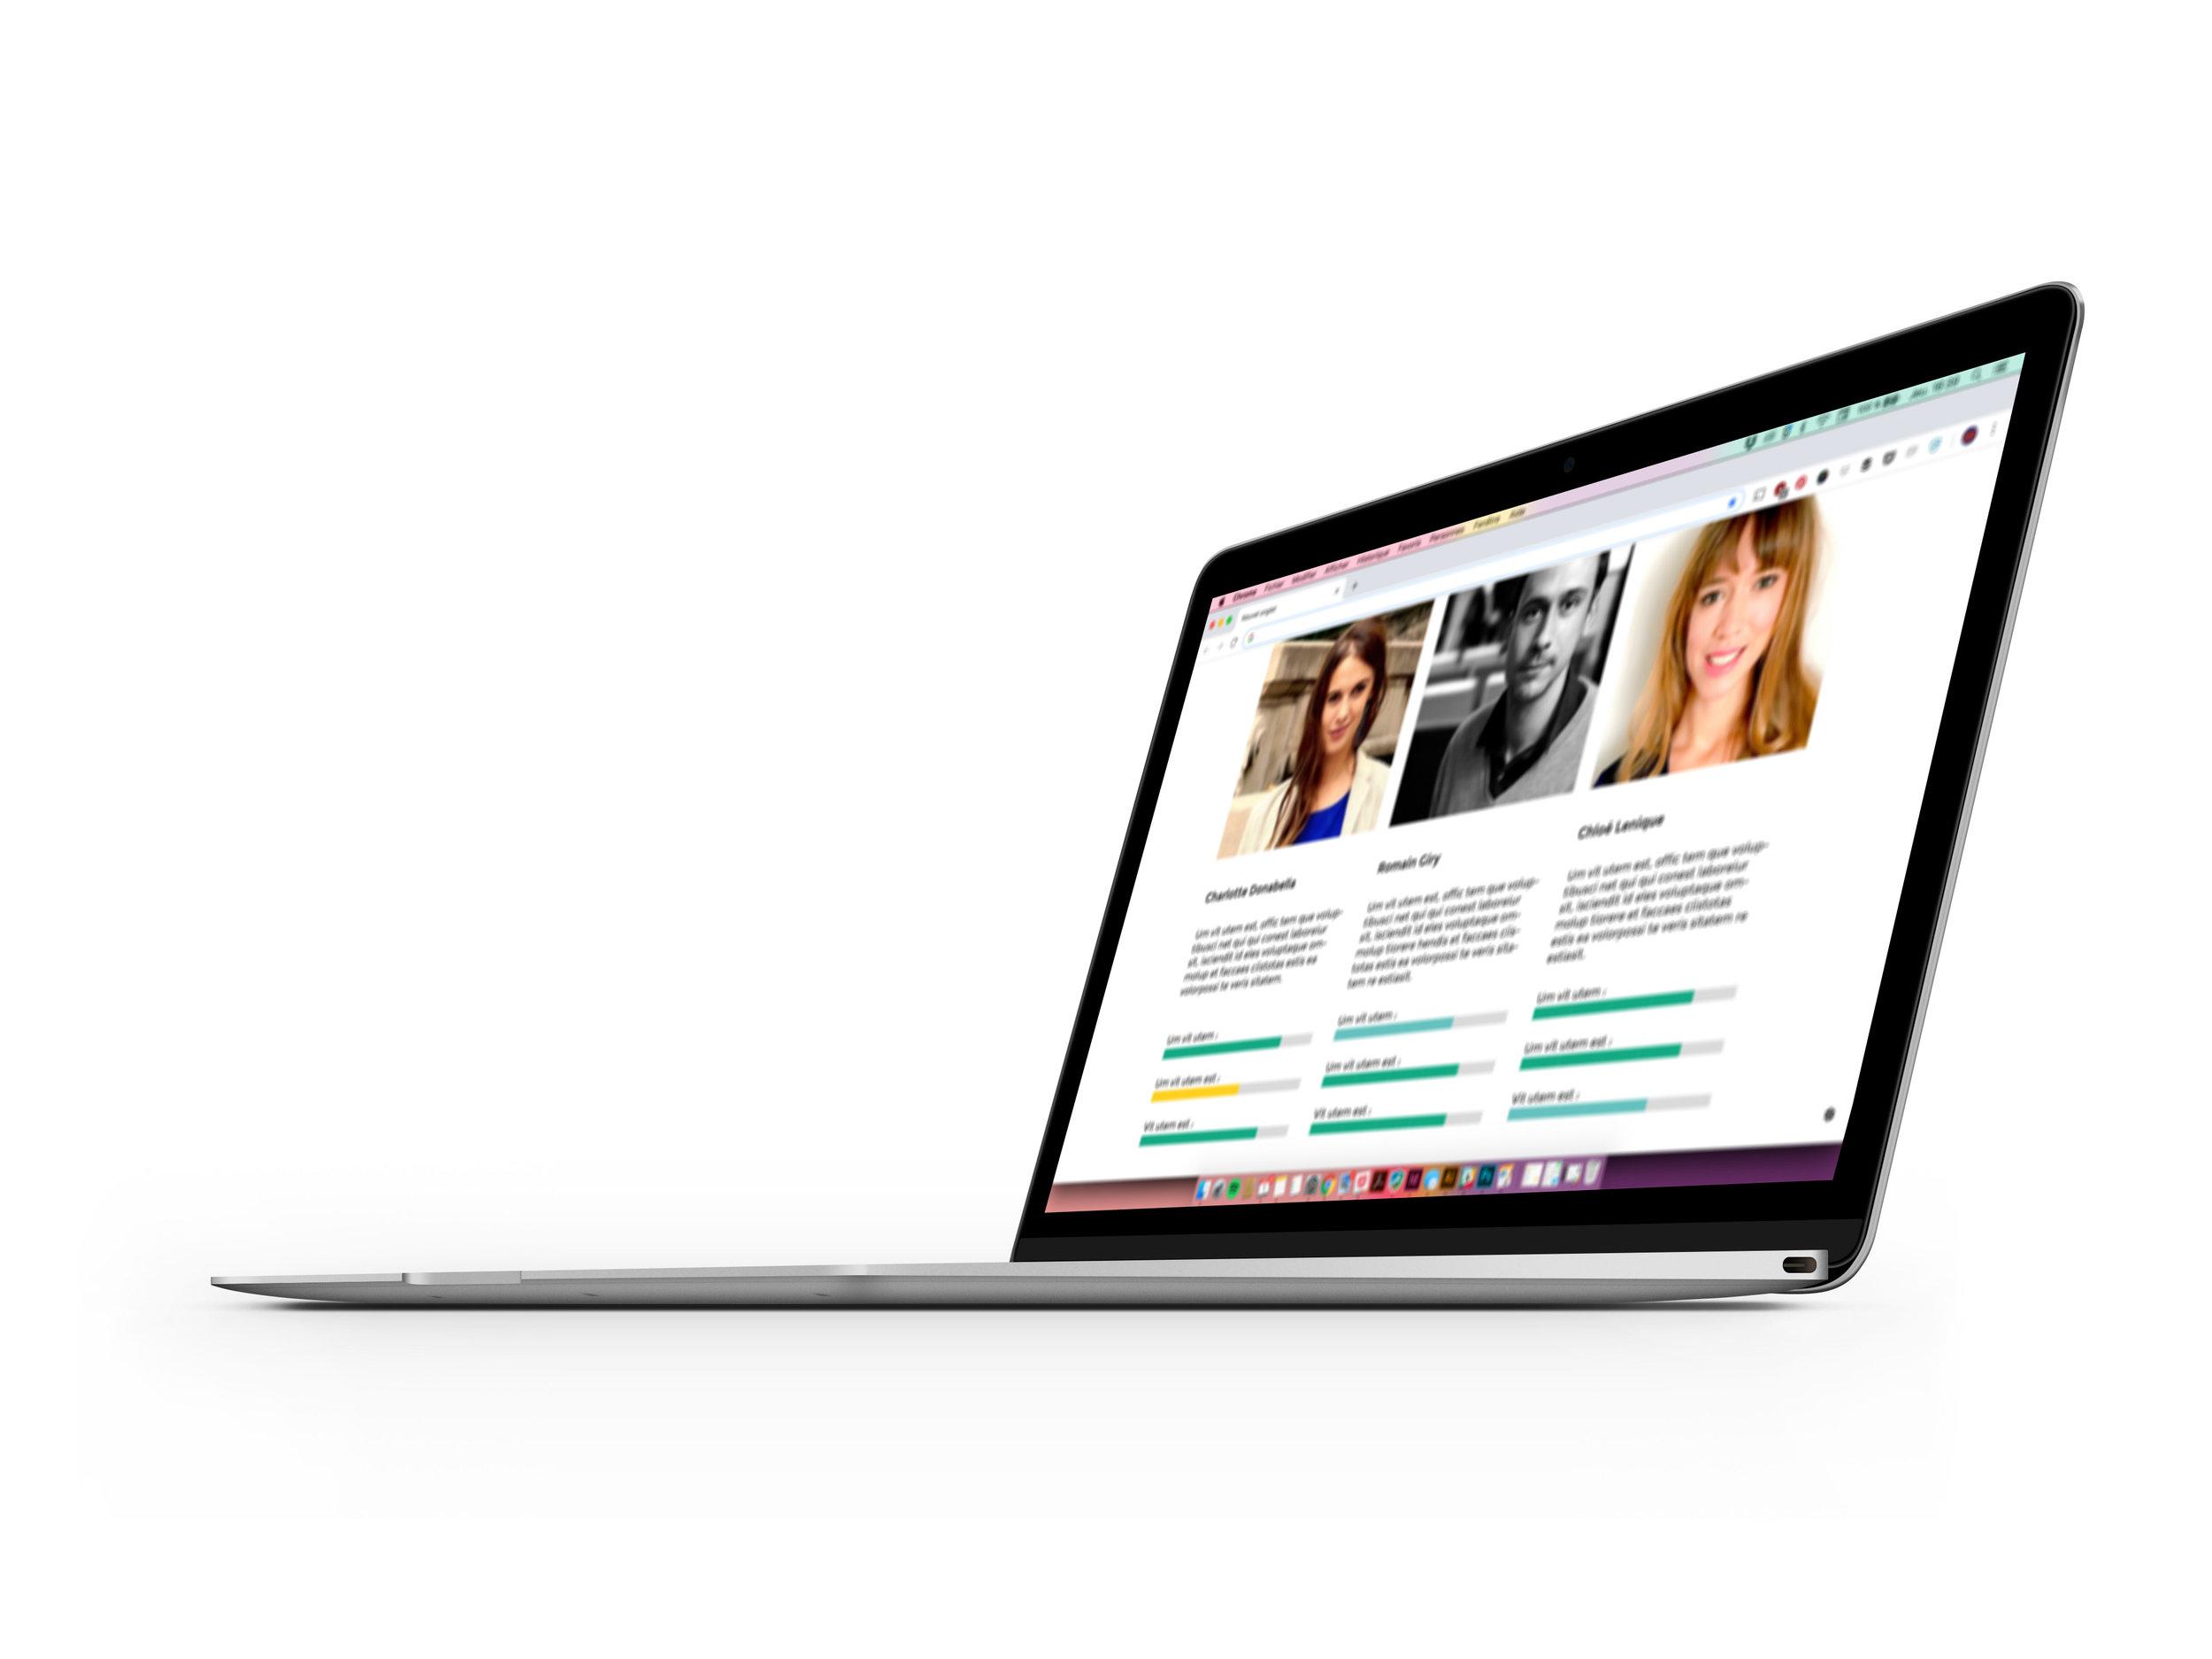 MacBook-Retina-Display-Psd-Mockup.jpg